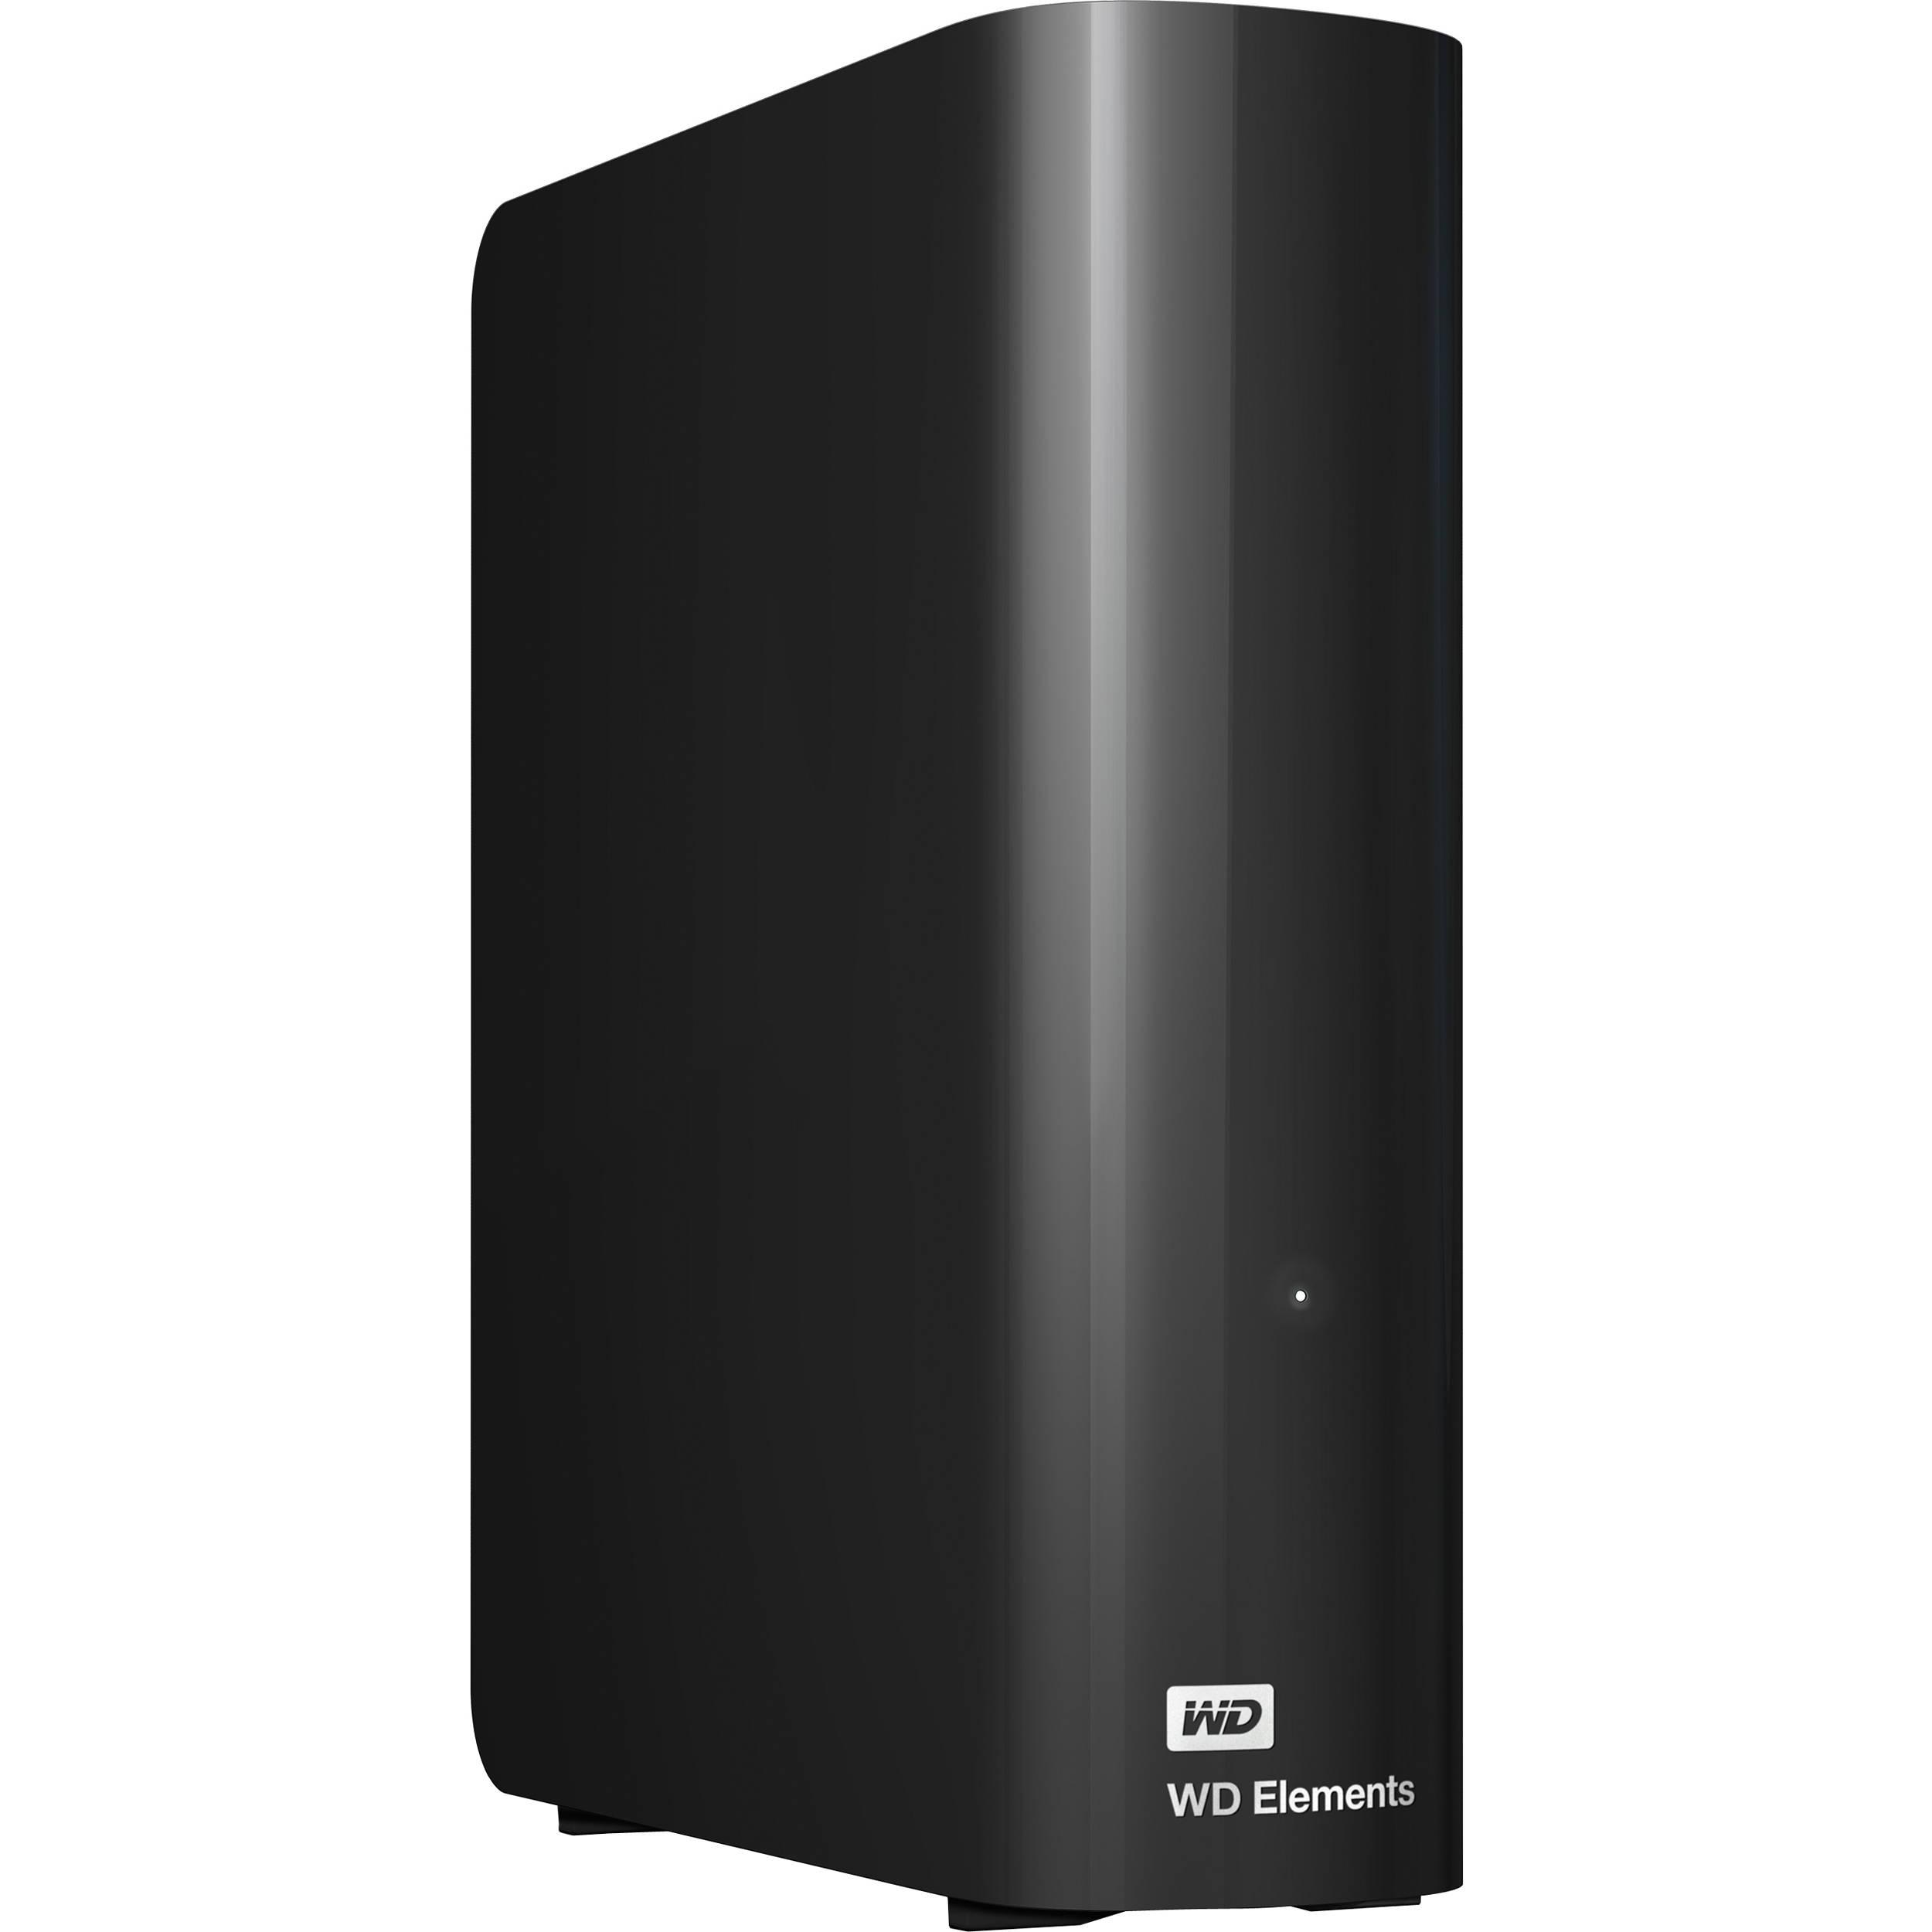 d3f82dbba1 WD 4TB Elements Desktop USB 3.0 External Hard WDBWLG0040HBK-NESN